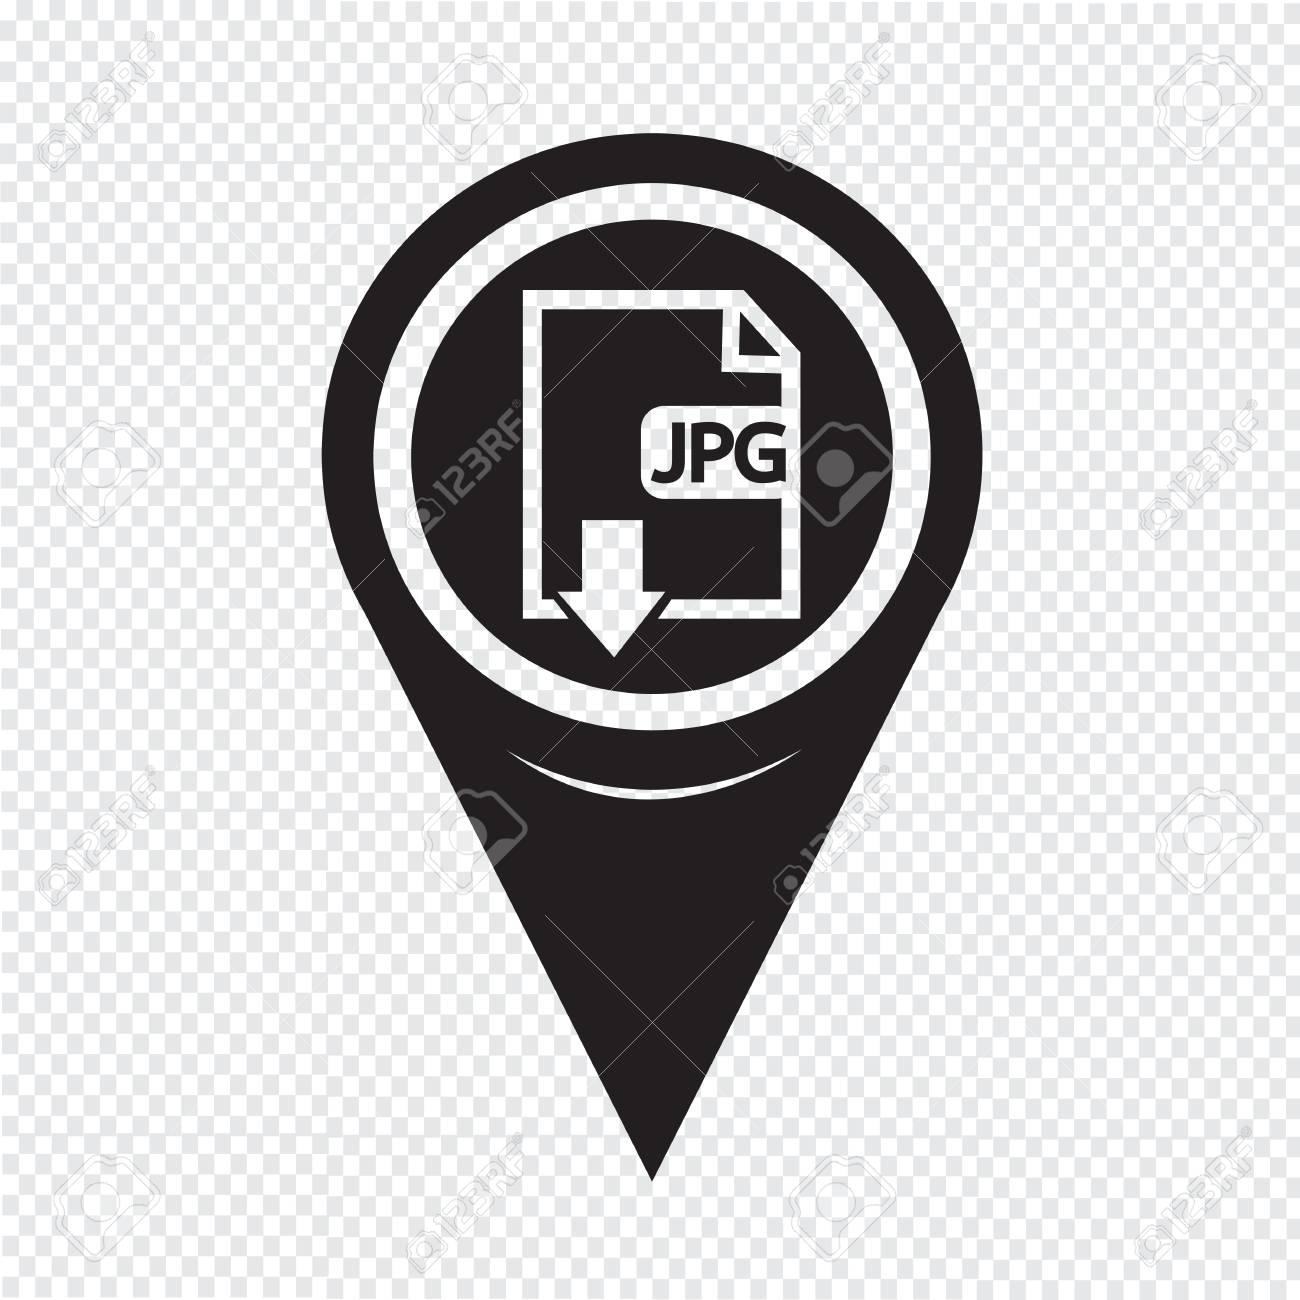 Map pin pointer file type jpg icon royalty free cliparts vectors map pin pointer file type jpg icon stock vector 49089909 buycottarizona Choice Image